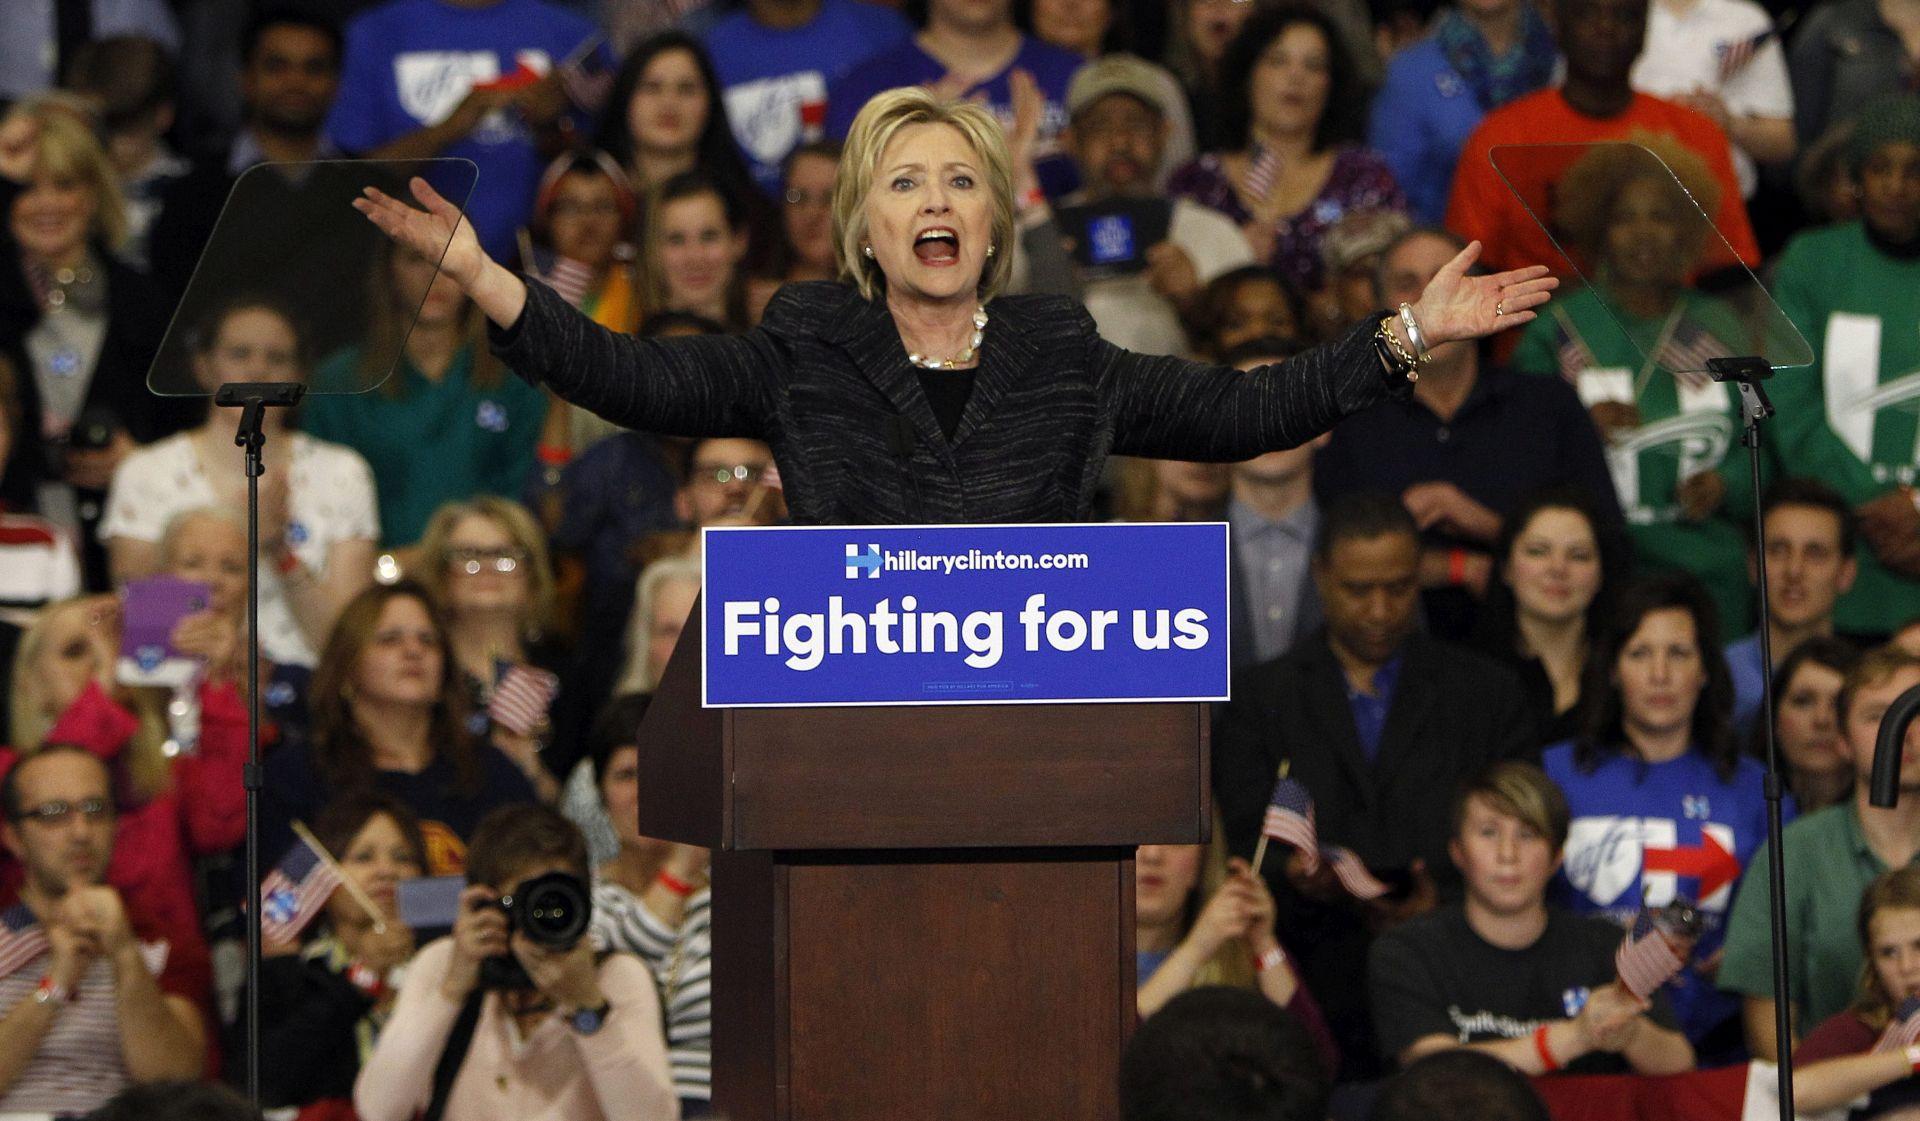 ANKETA: U utrci za Bijelu kuću Clinton vodi za 11 posto